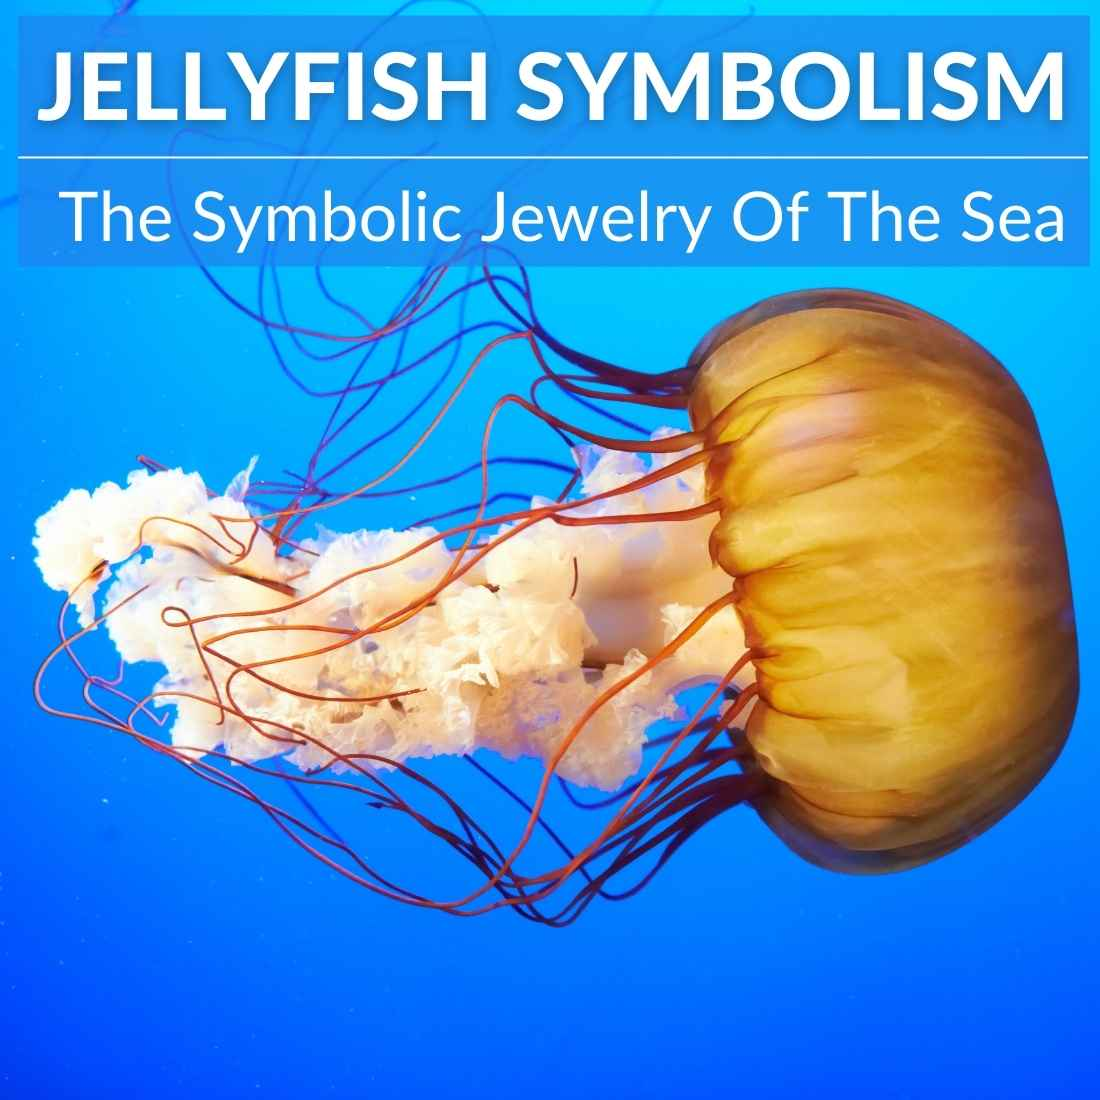 Jellyfish symbolism